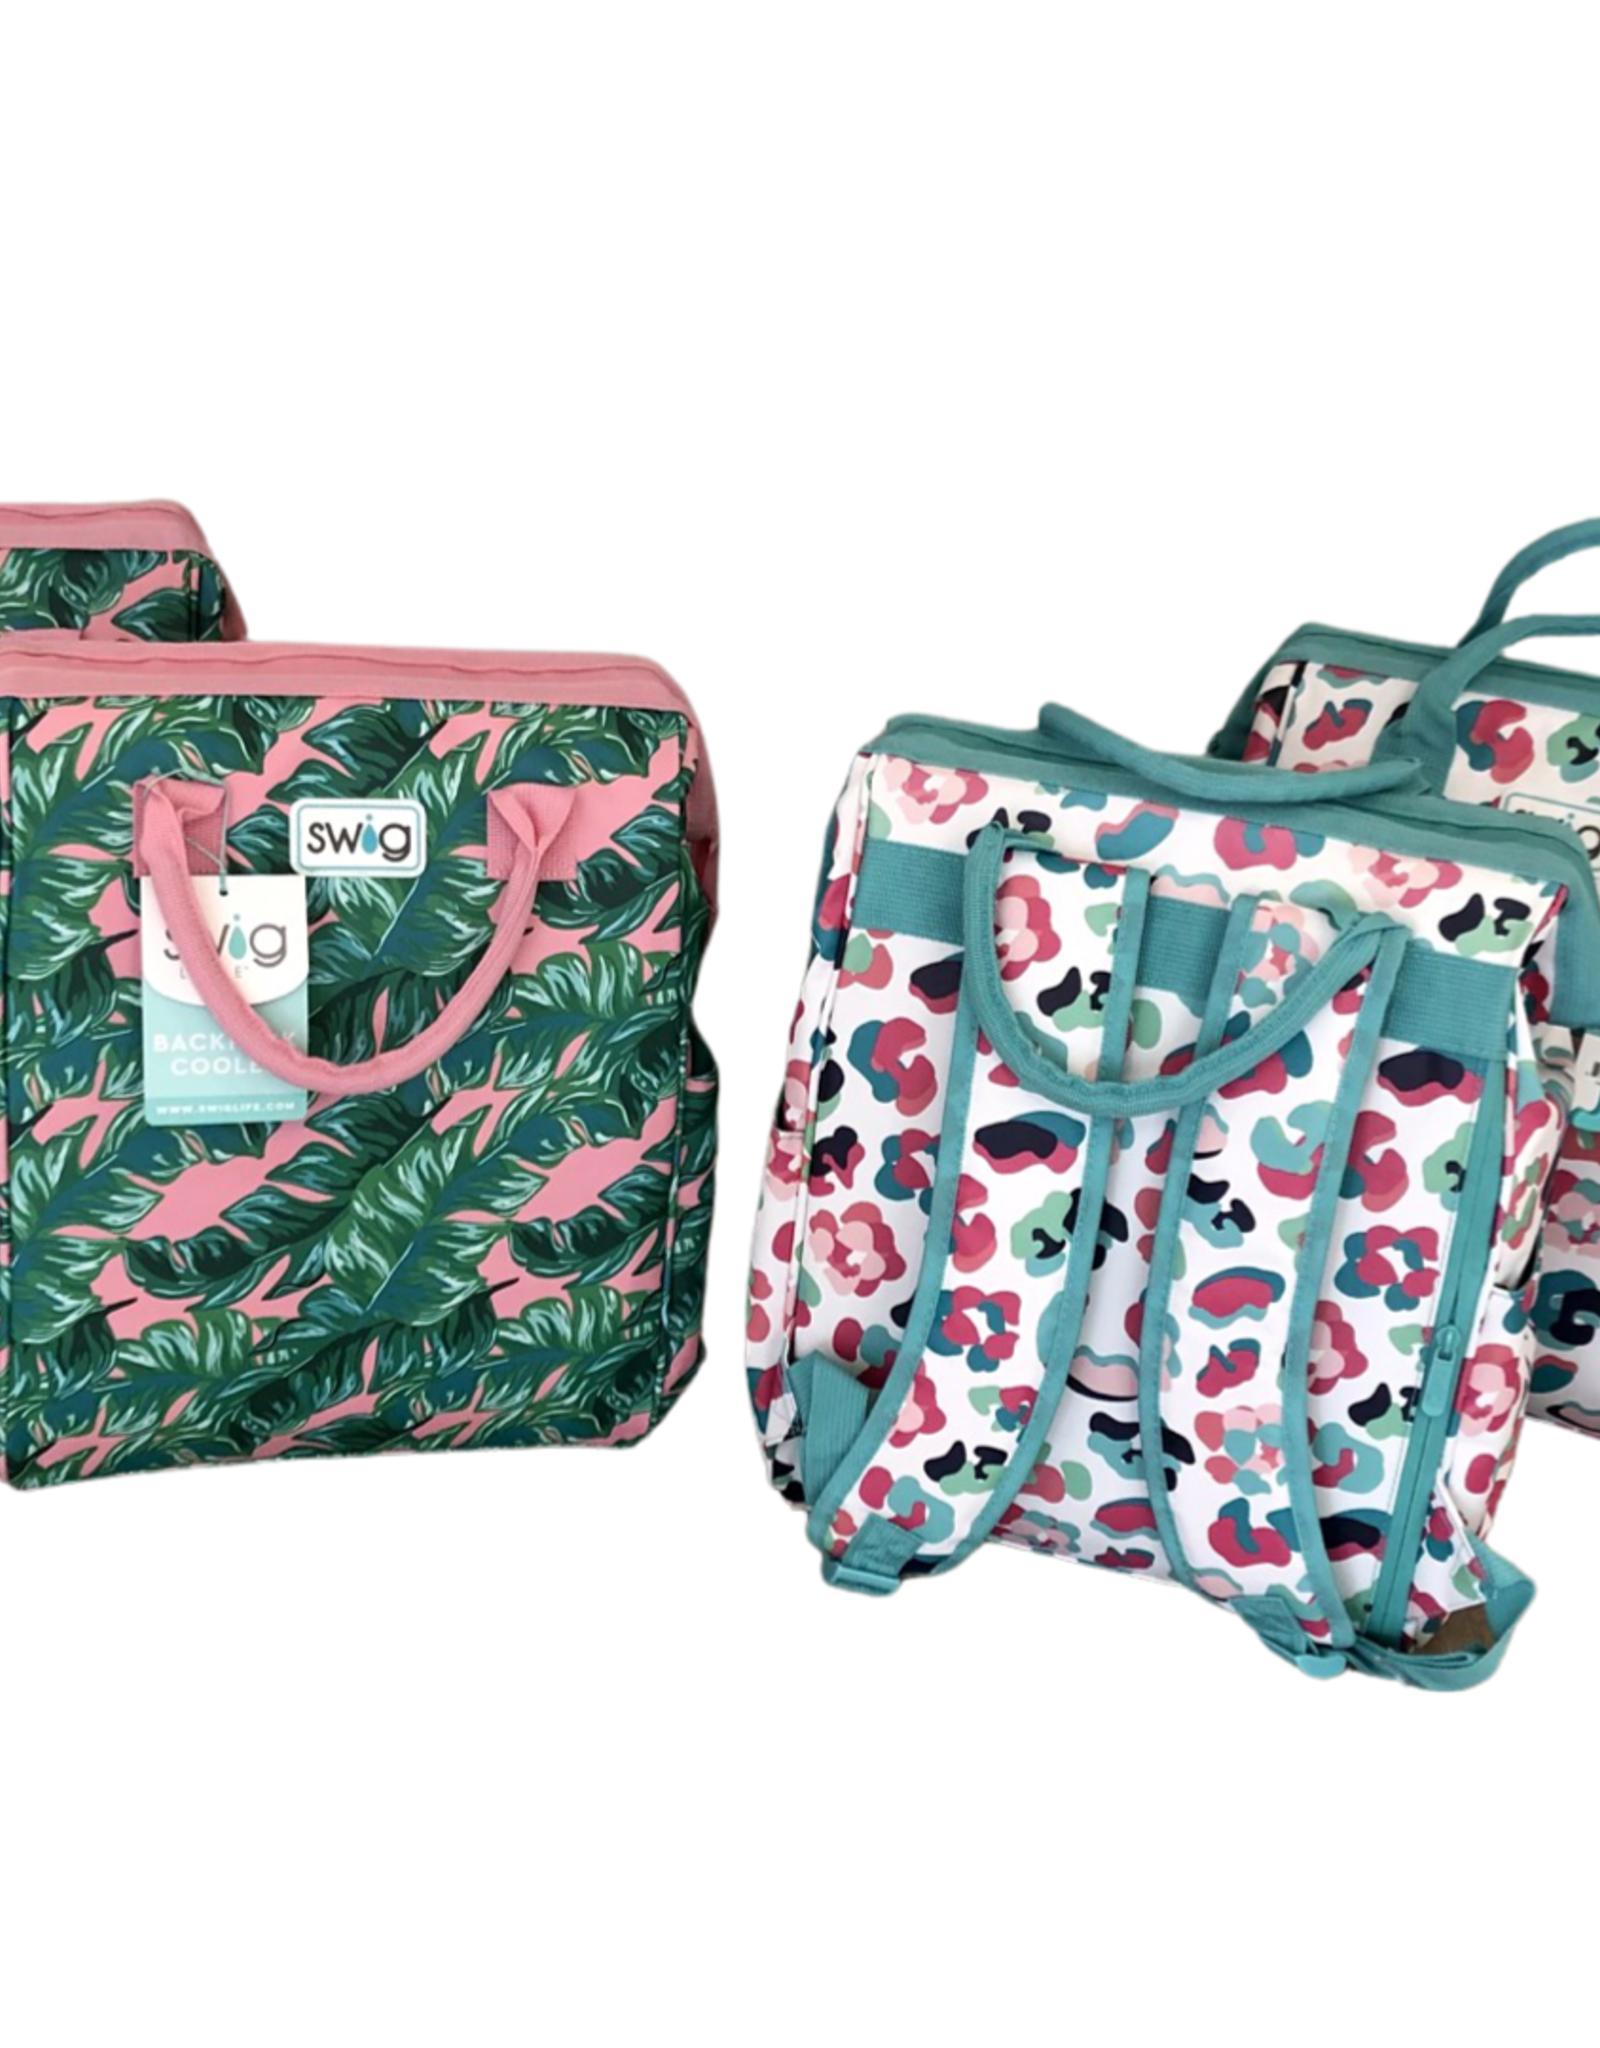 Swig Packi Backpack Cooler